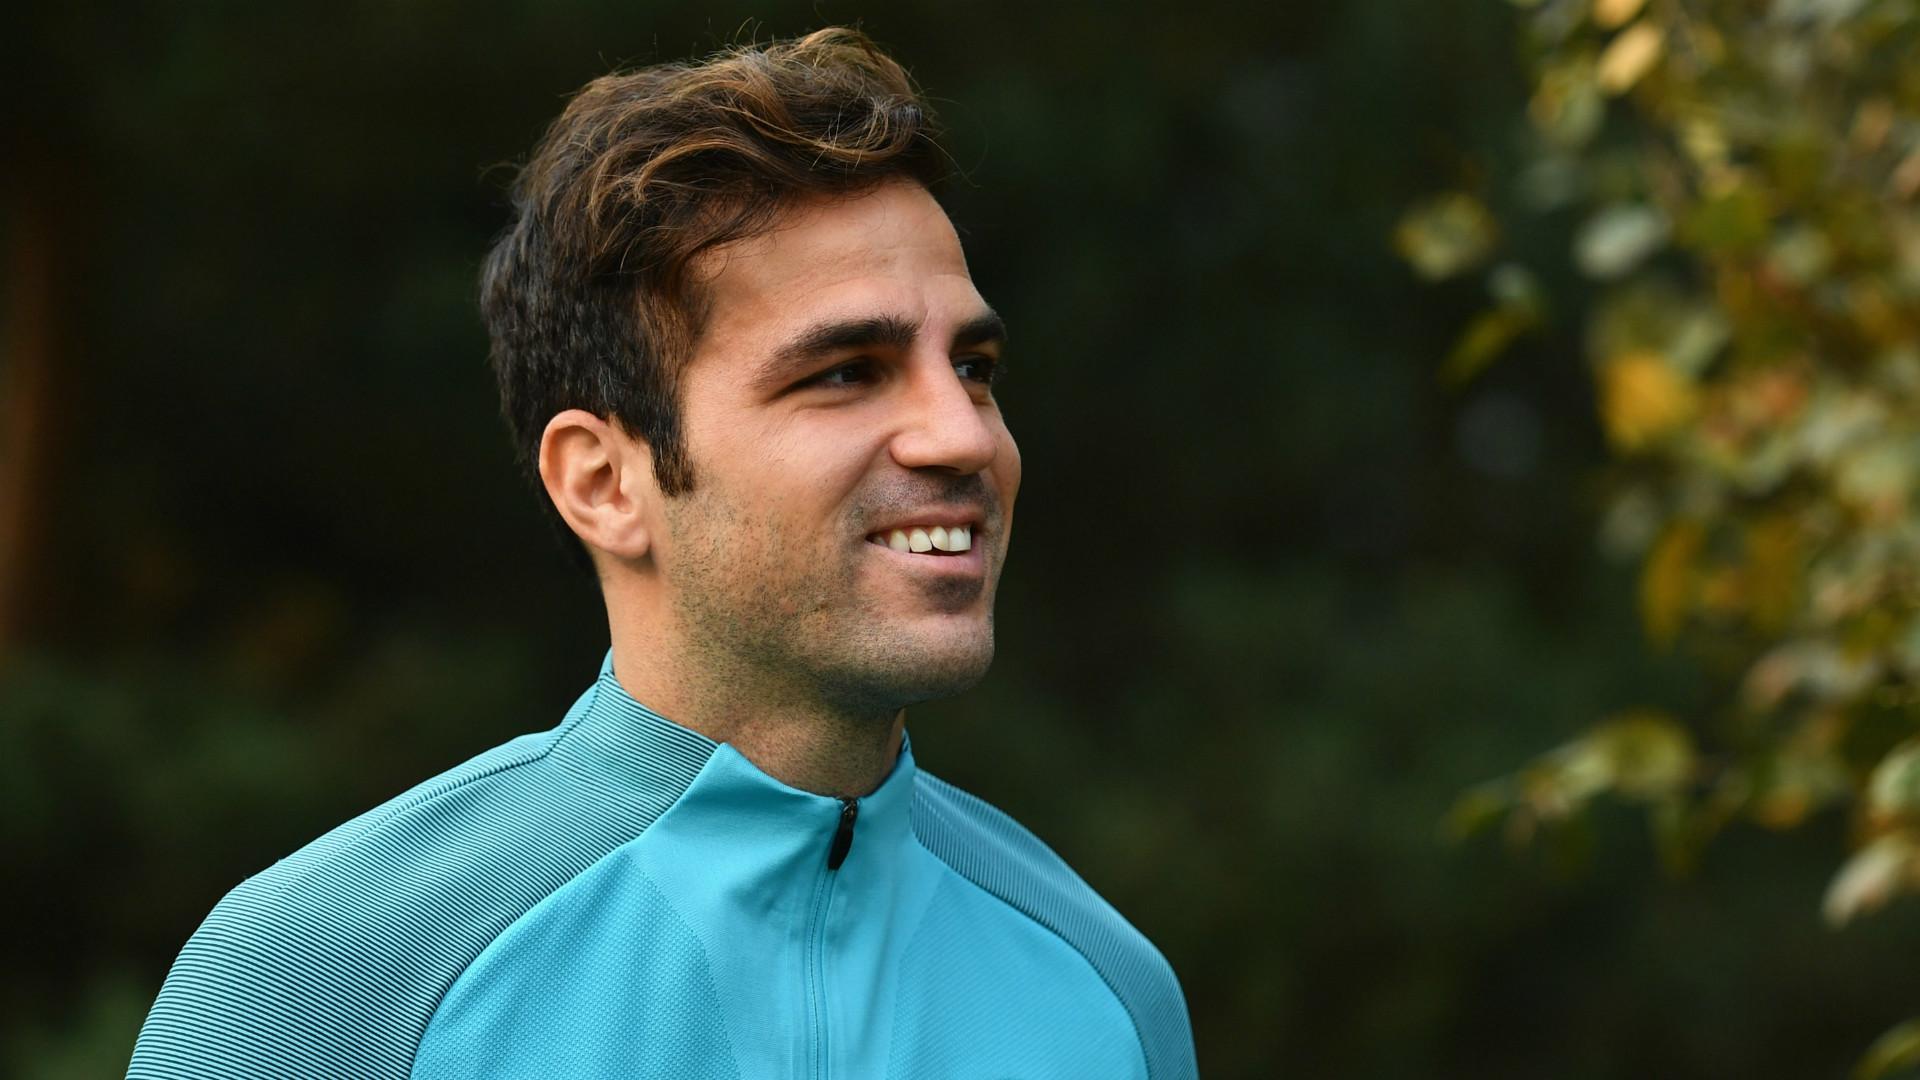 Fabregas reveals he spoke to Moyes about Man Utd move